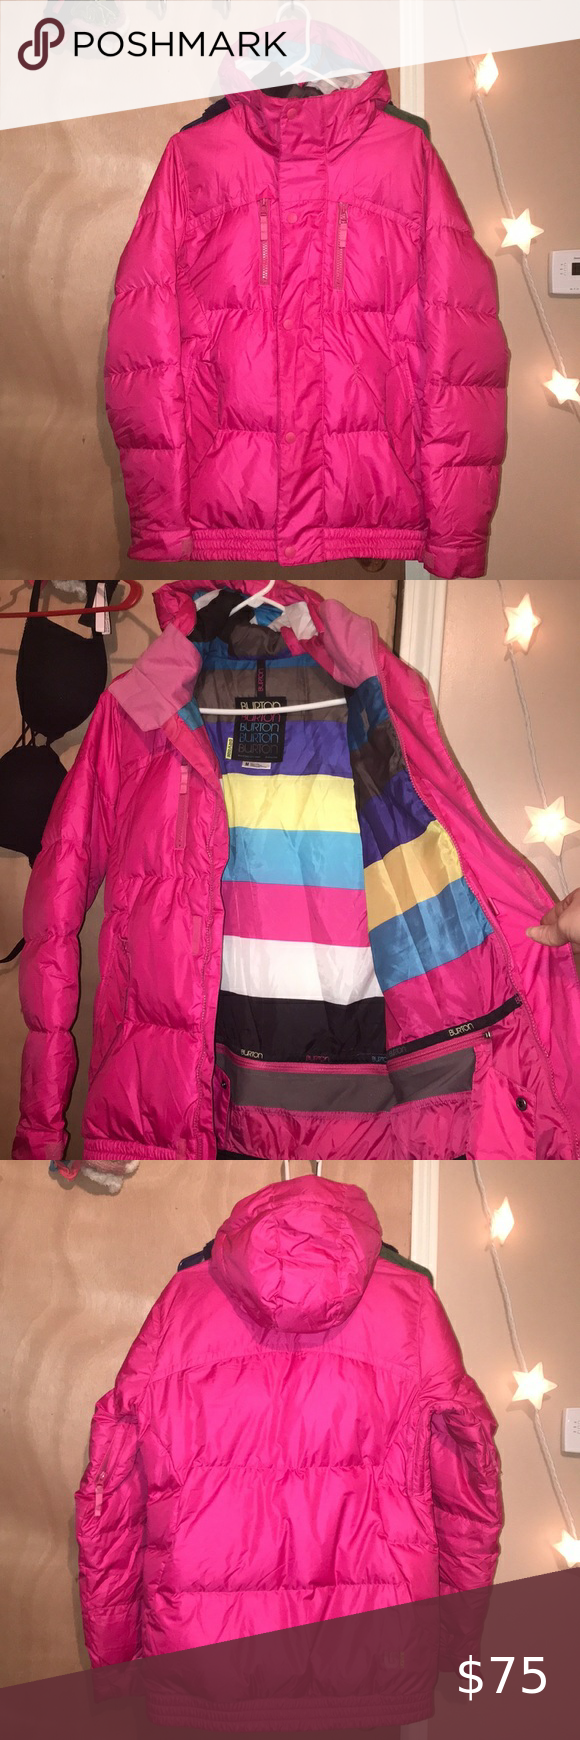 Burton Down Feather Puffer Jacket Clothes Design Fashion Coats For Women [ 1740 x 580 Pixel ]